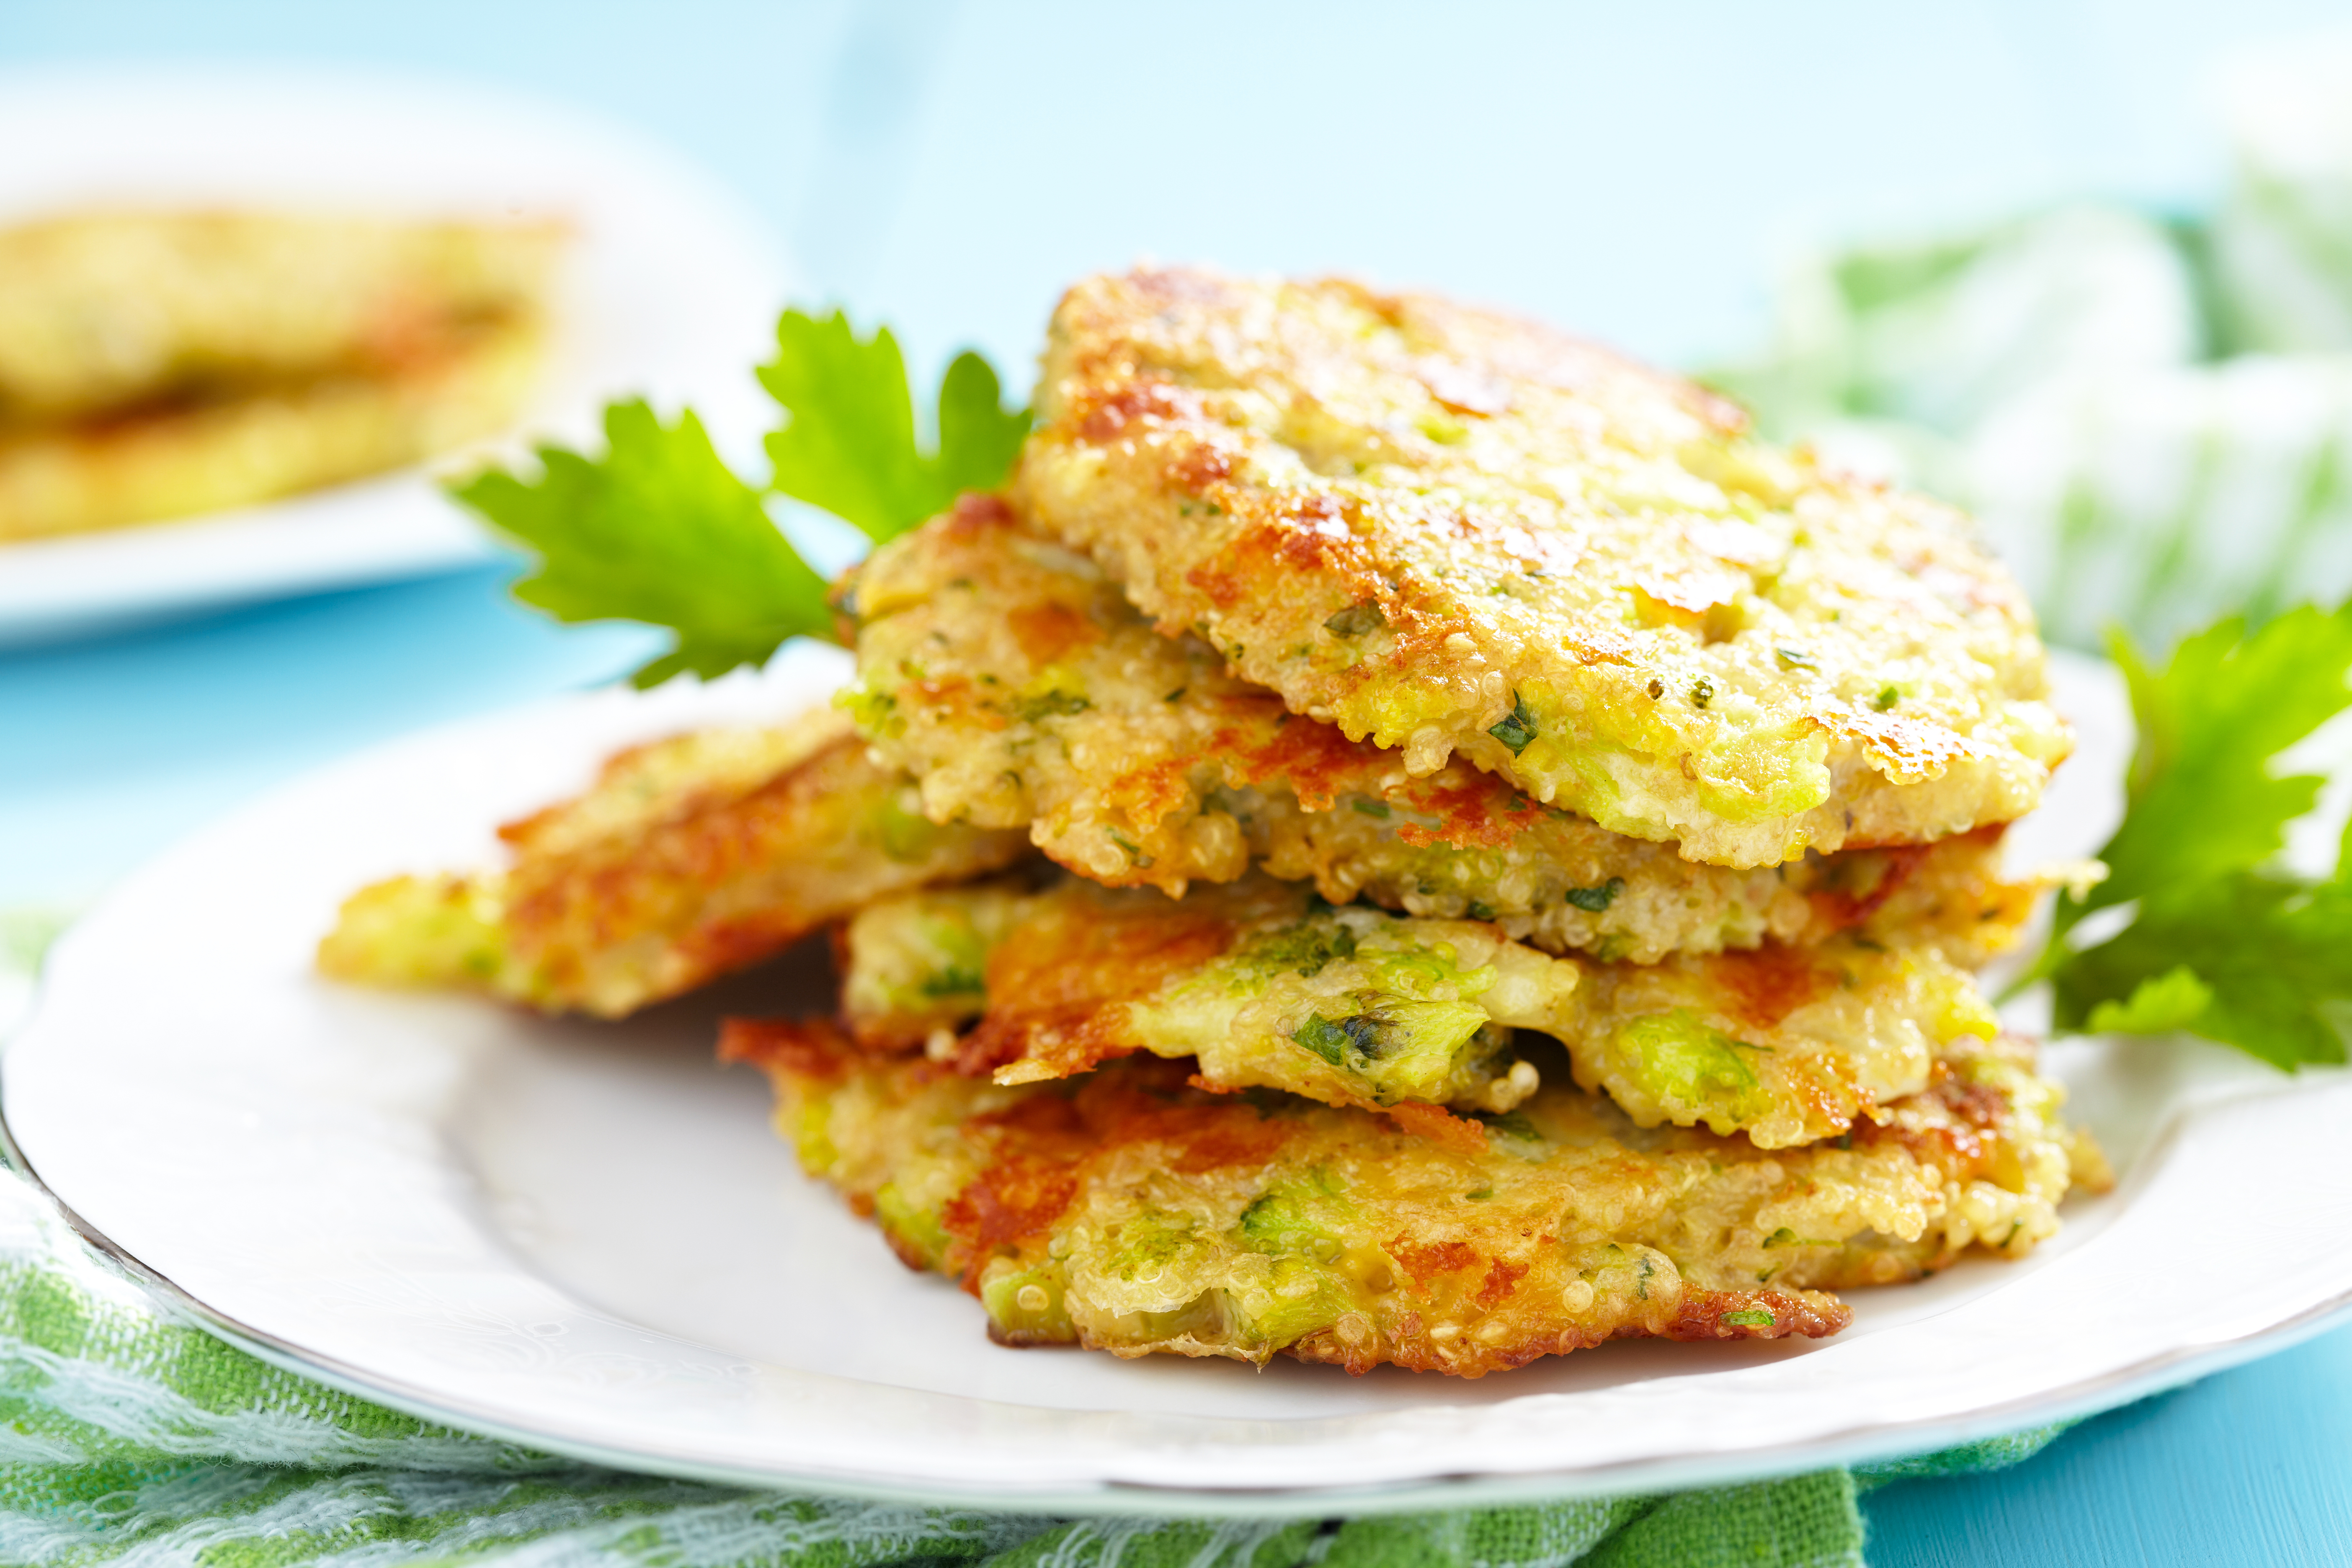 reibekuchen-mit-brokkoli-quinoa-paprika-und-kaese